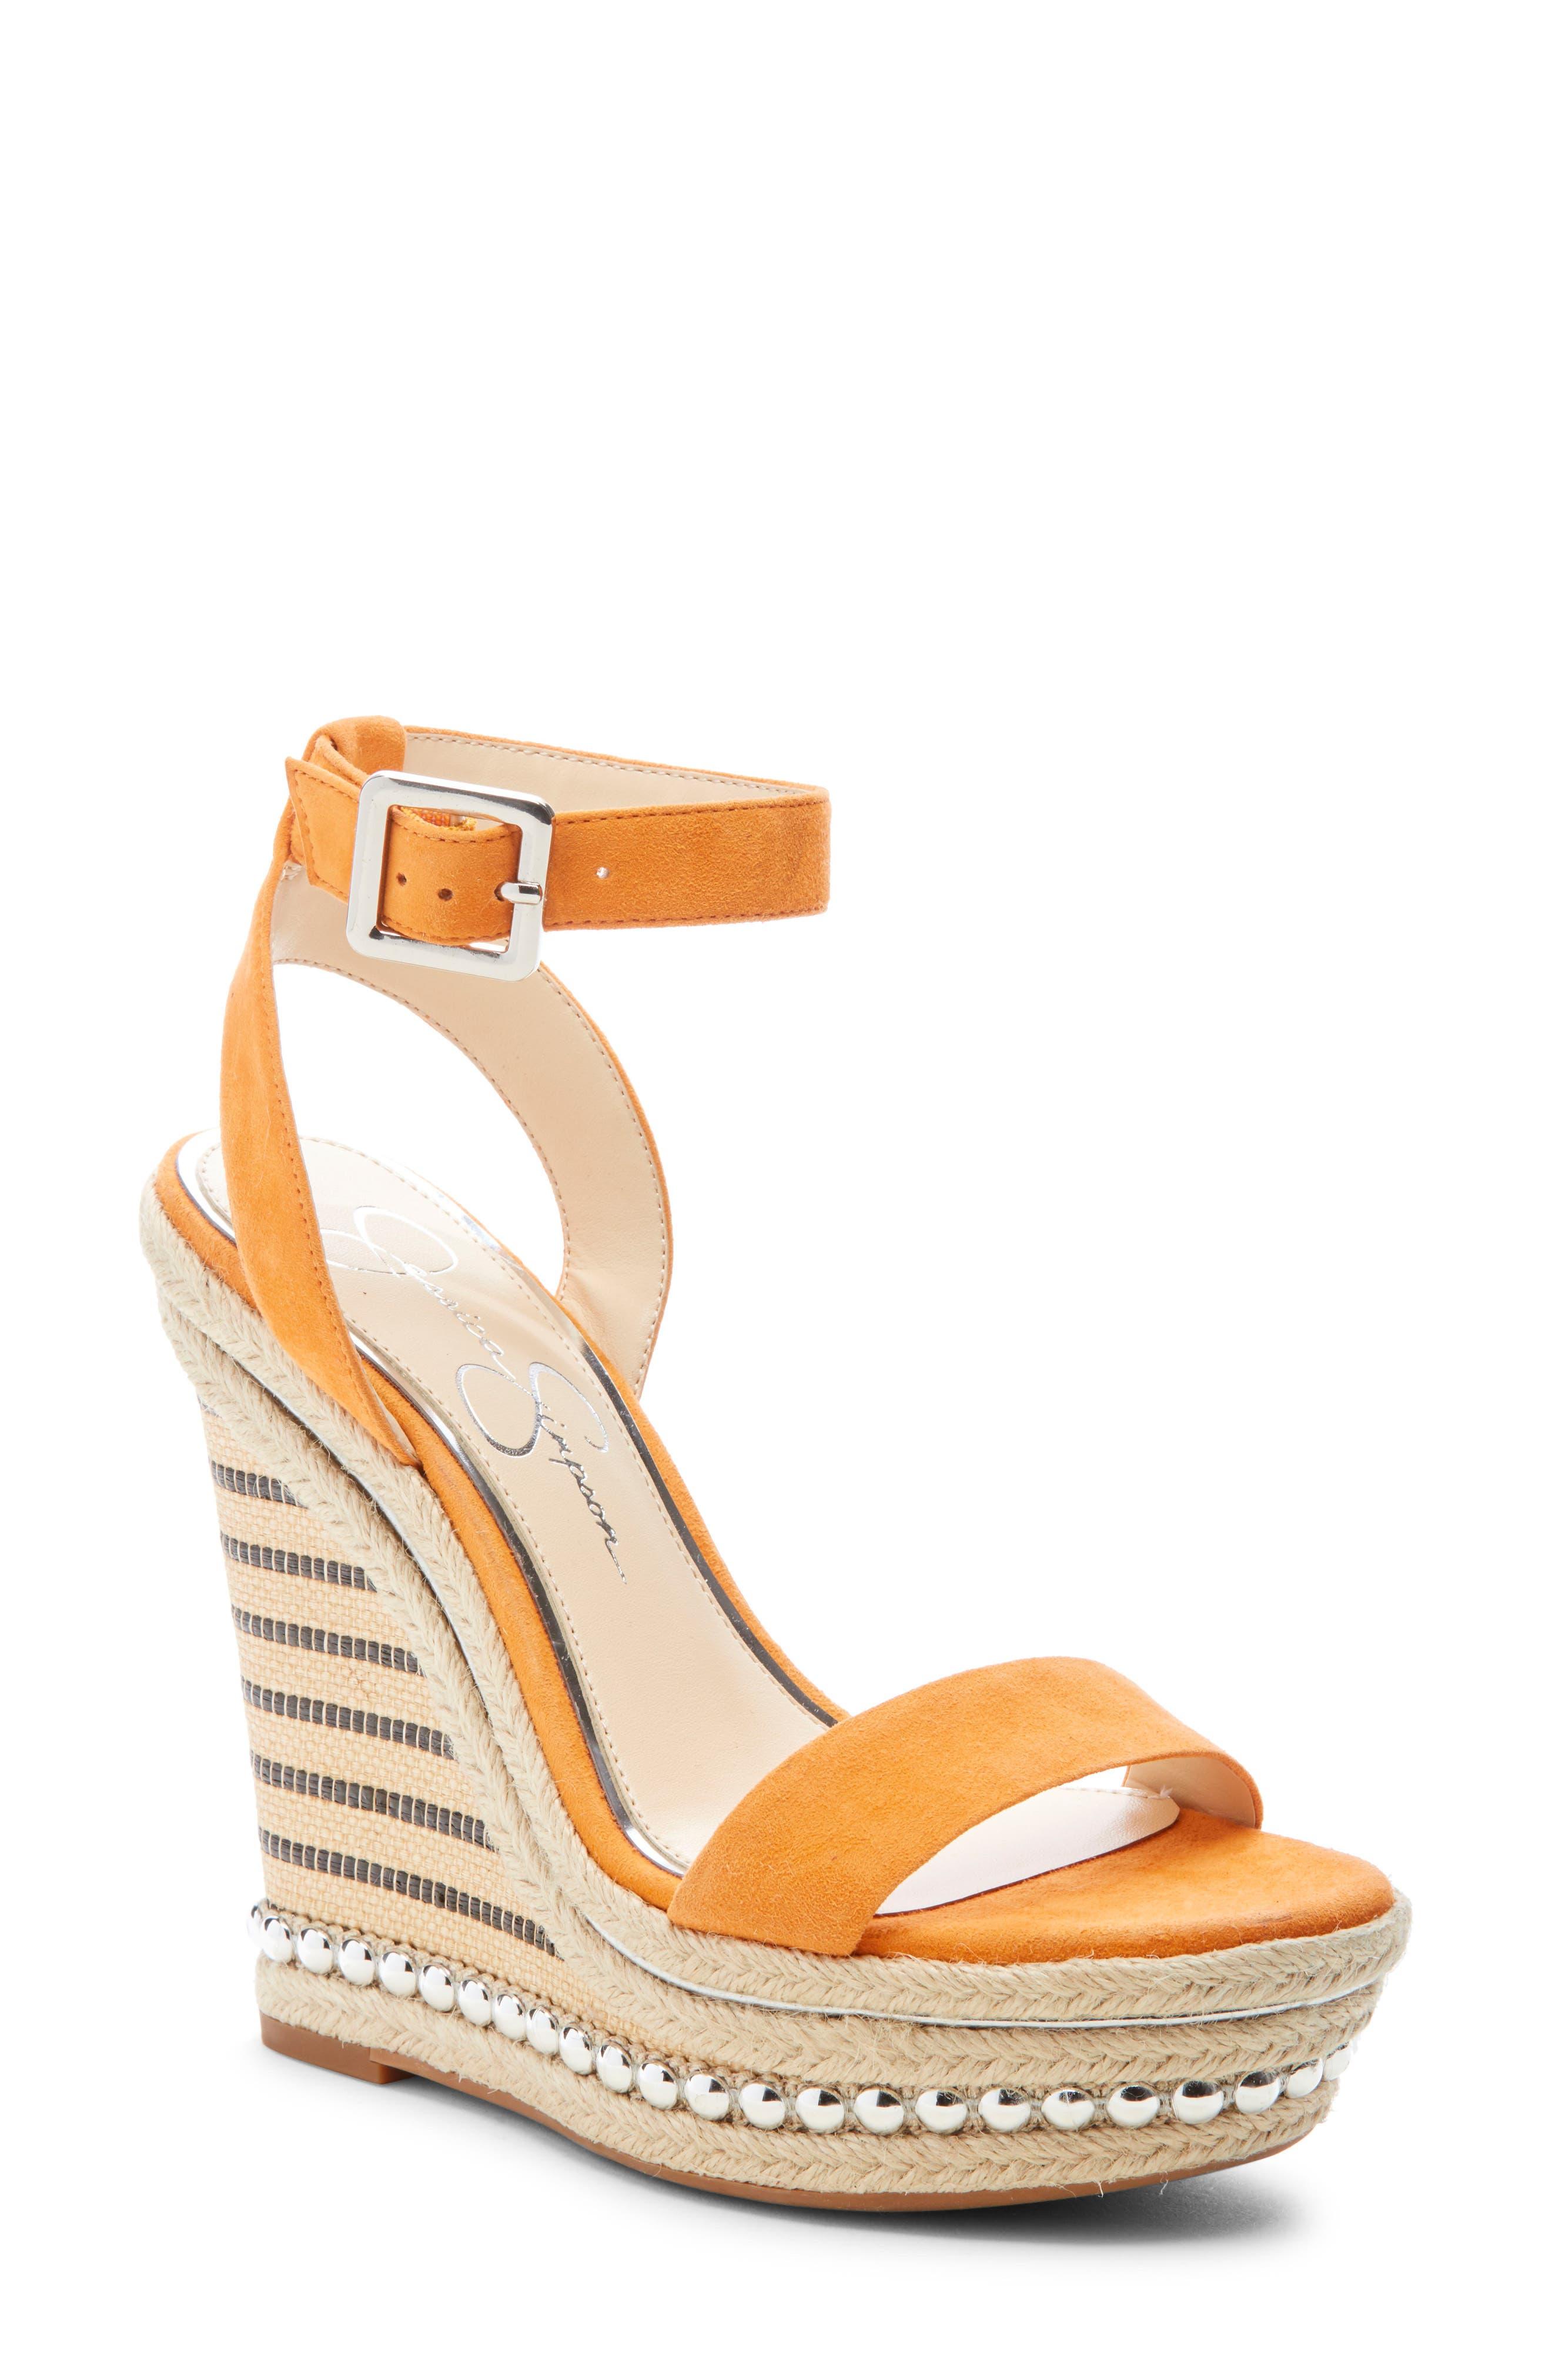 Jessica Simpson Alinda Embellished Wedge Sandal, Orange